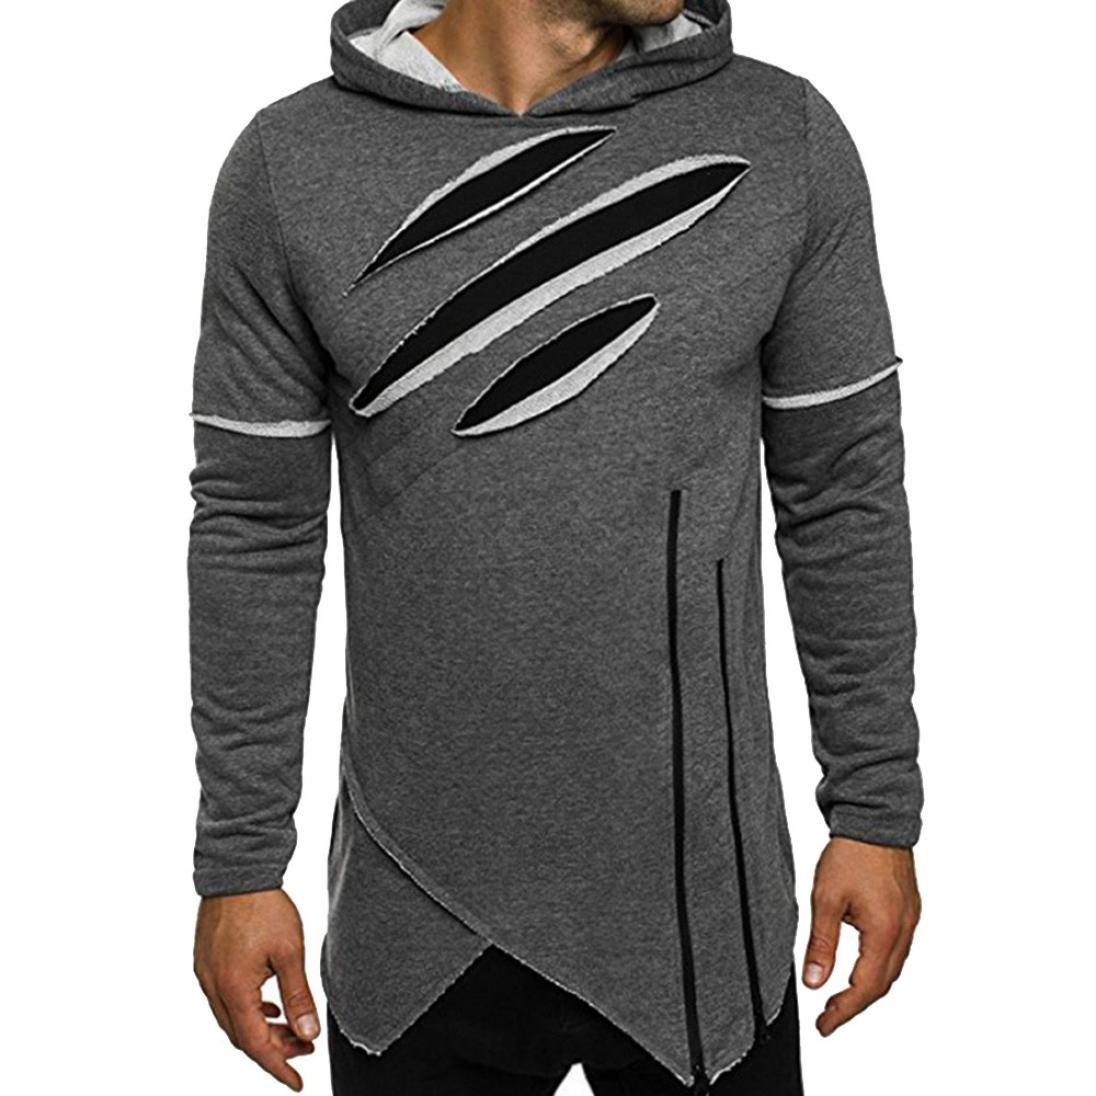 Ankola Mens Fashion Long Sleeve Patched Design Hoodie Hooded Sweatshirt Tops Jacket Coat Irregular Hem (XL, Gray)